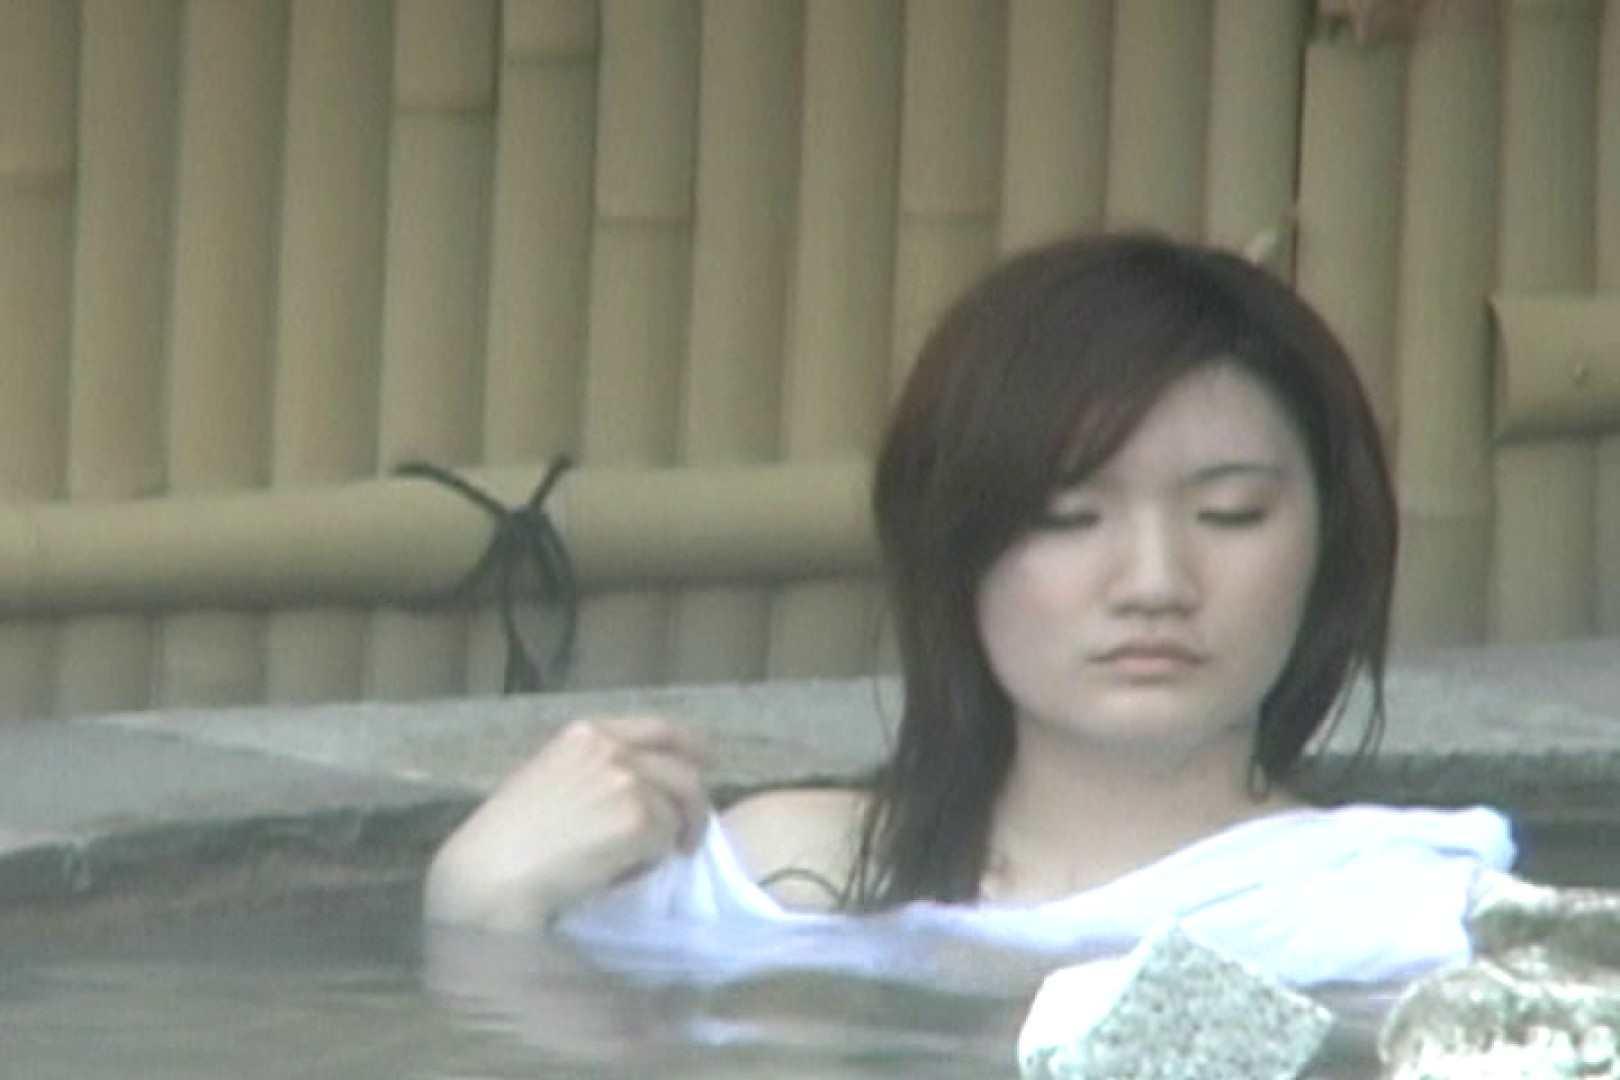 Aquaな露天風呂Vol.590 HなOL 濡れ場動画紹介 112pic 37